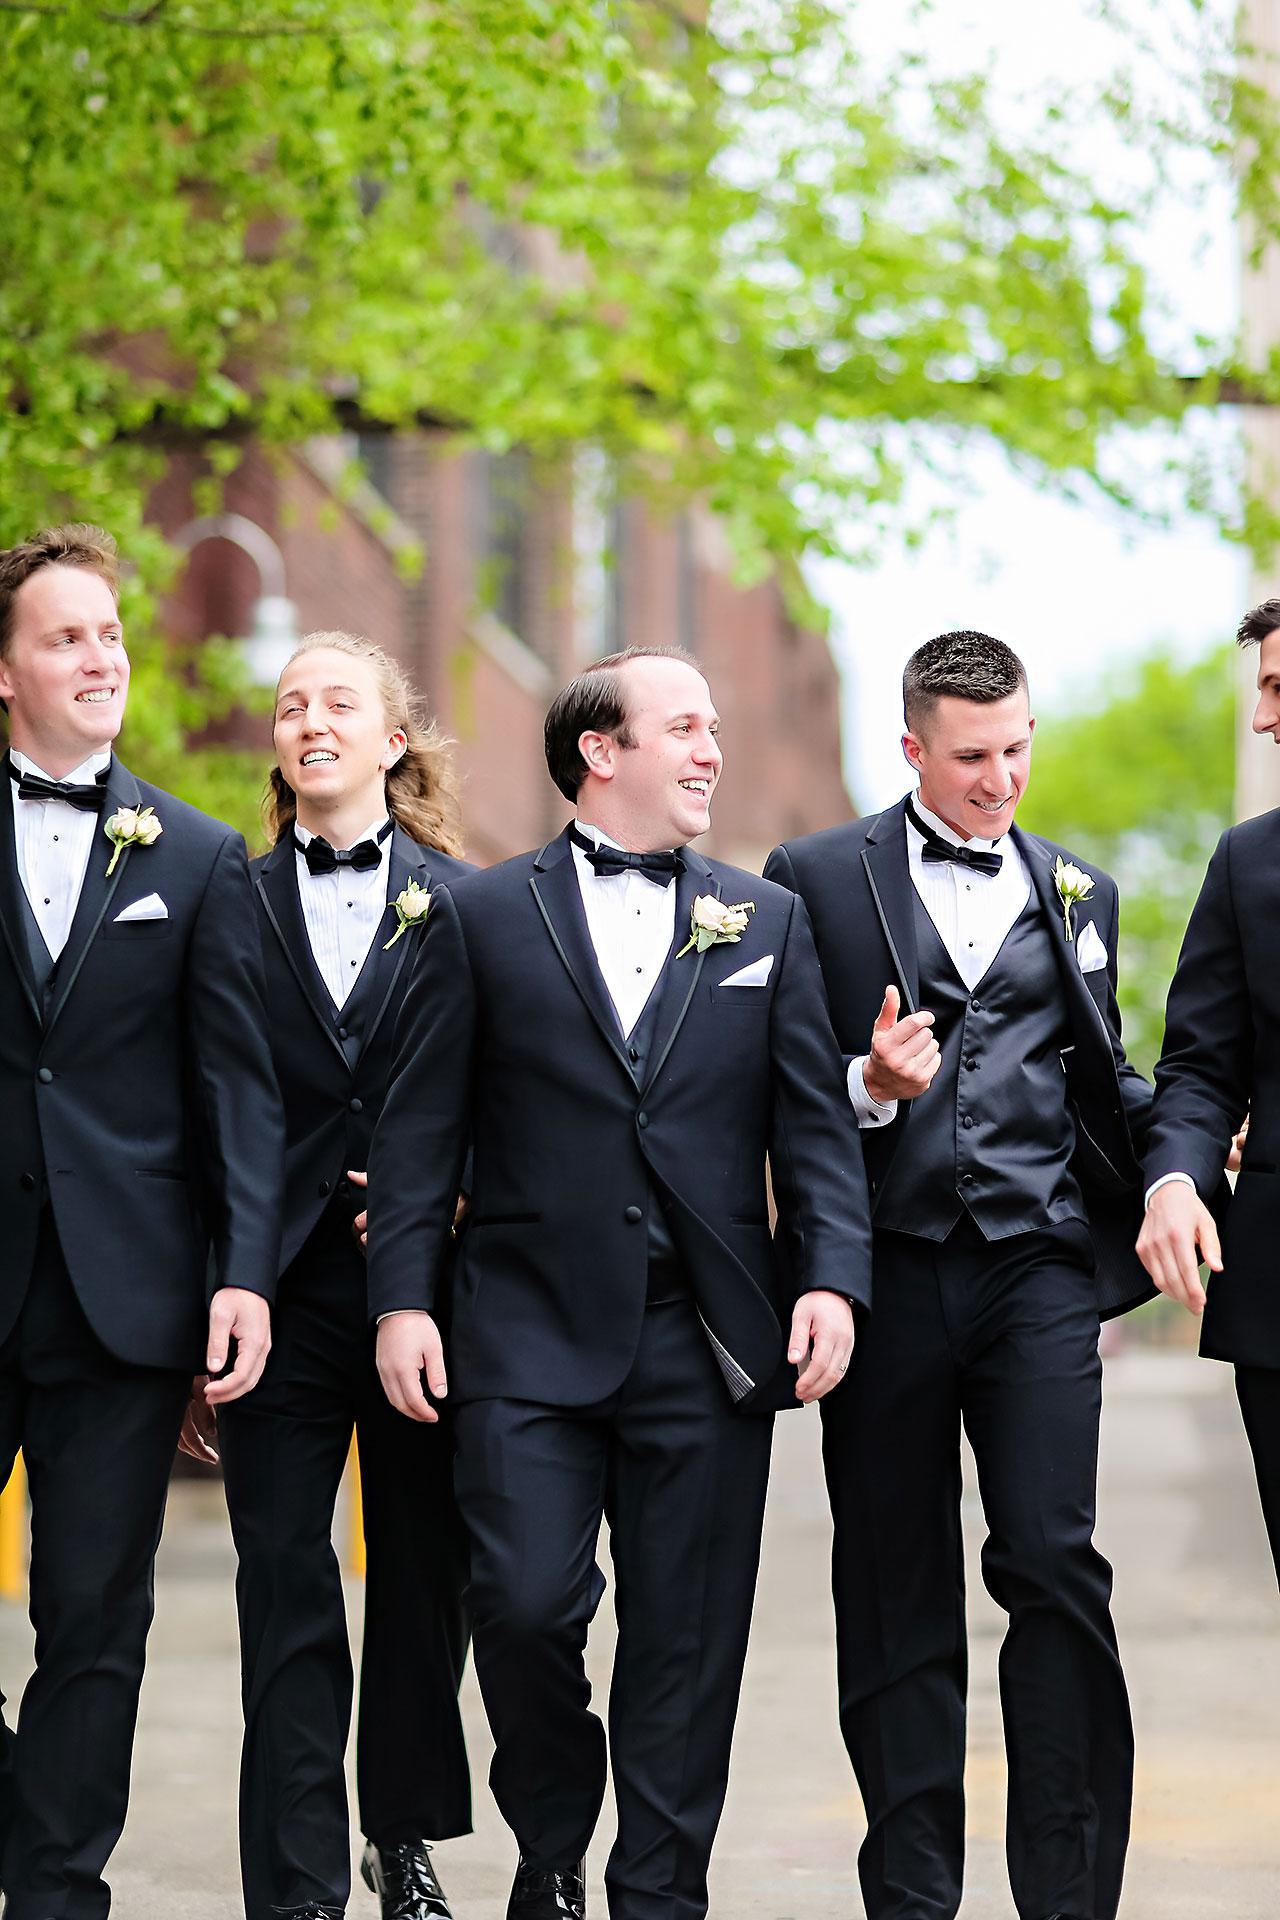 Allison Jeff Union Station Crowne Plaza Indianapolis wedding 149